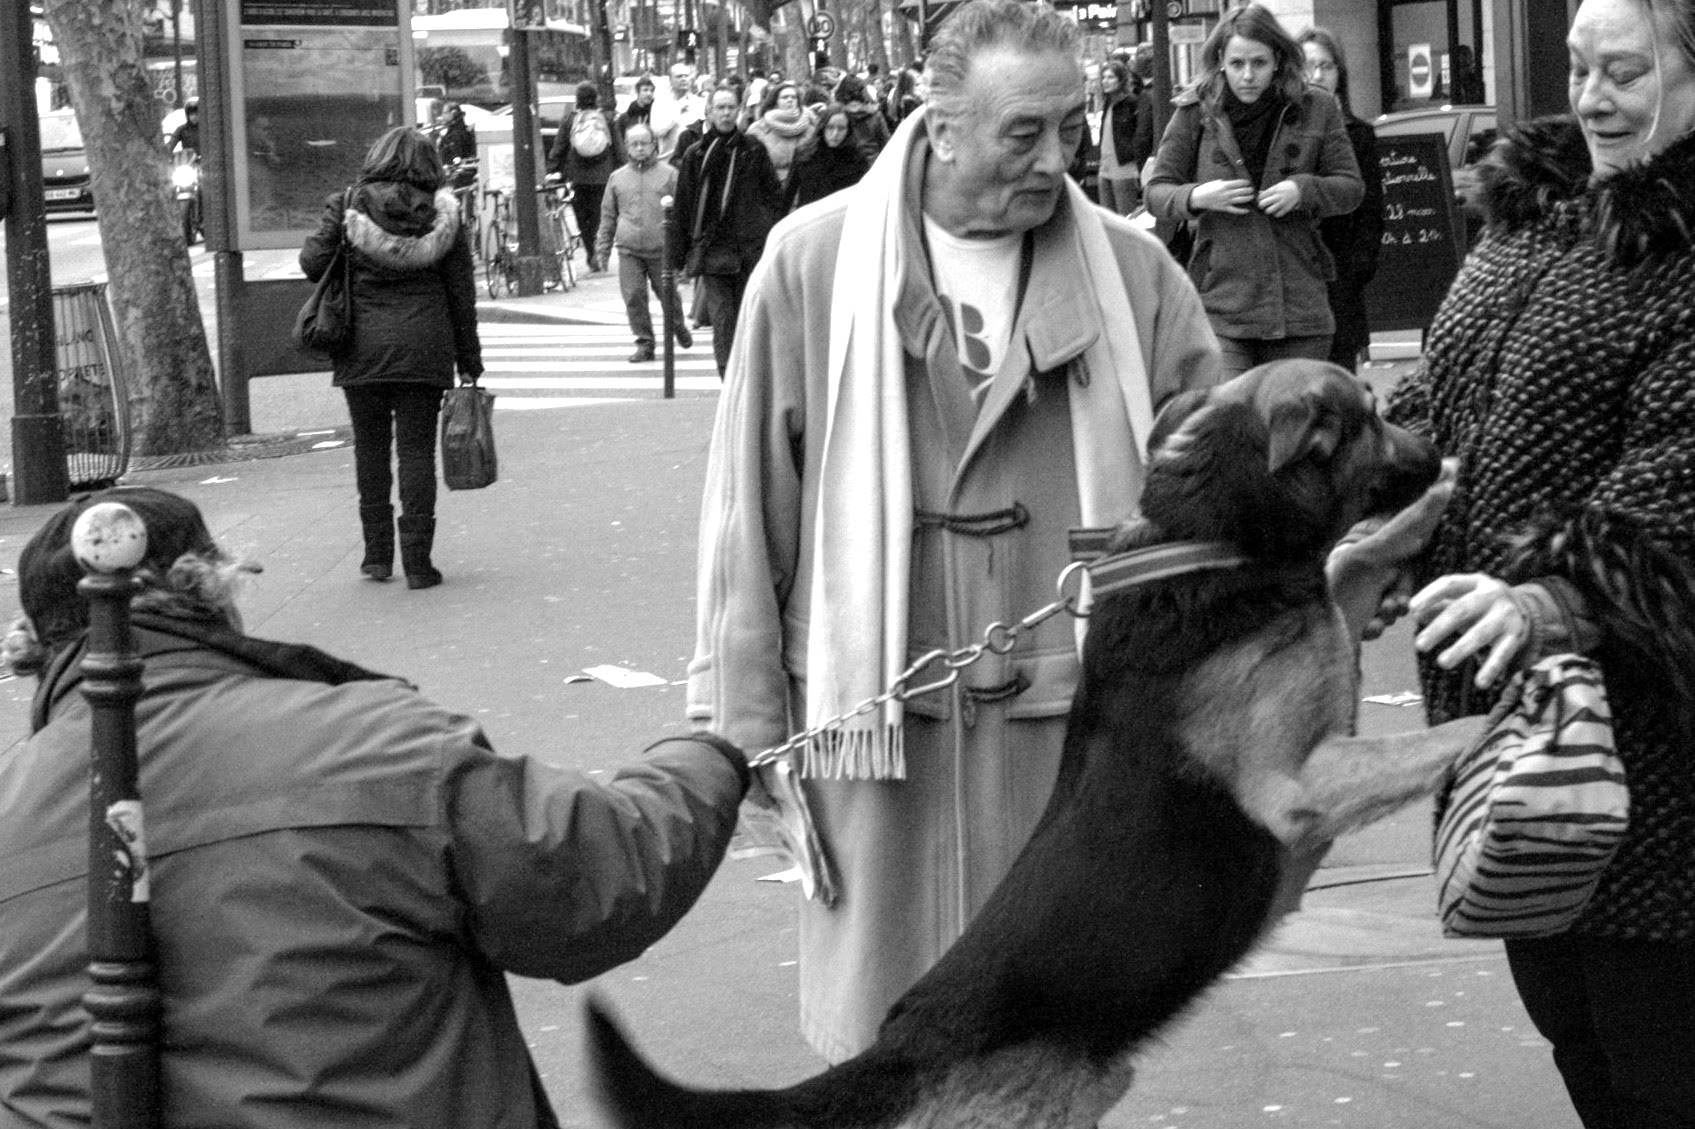 Streetphotography: Tipps von John Free